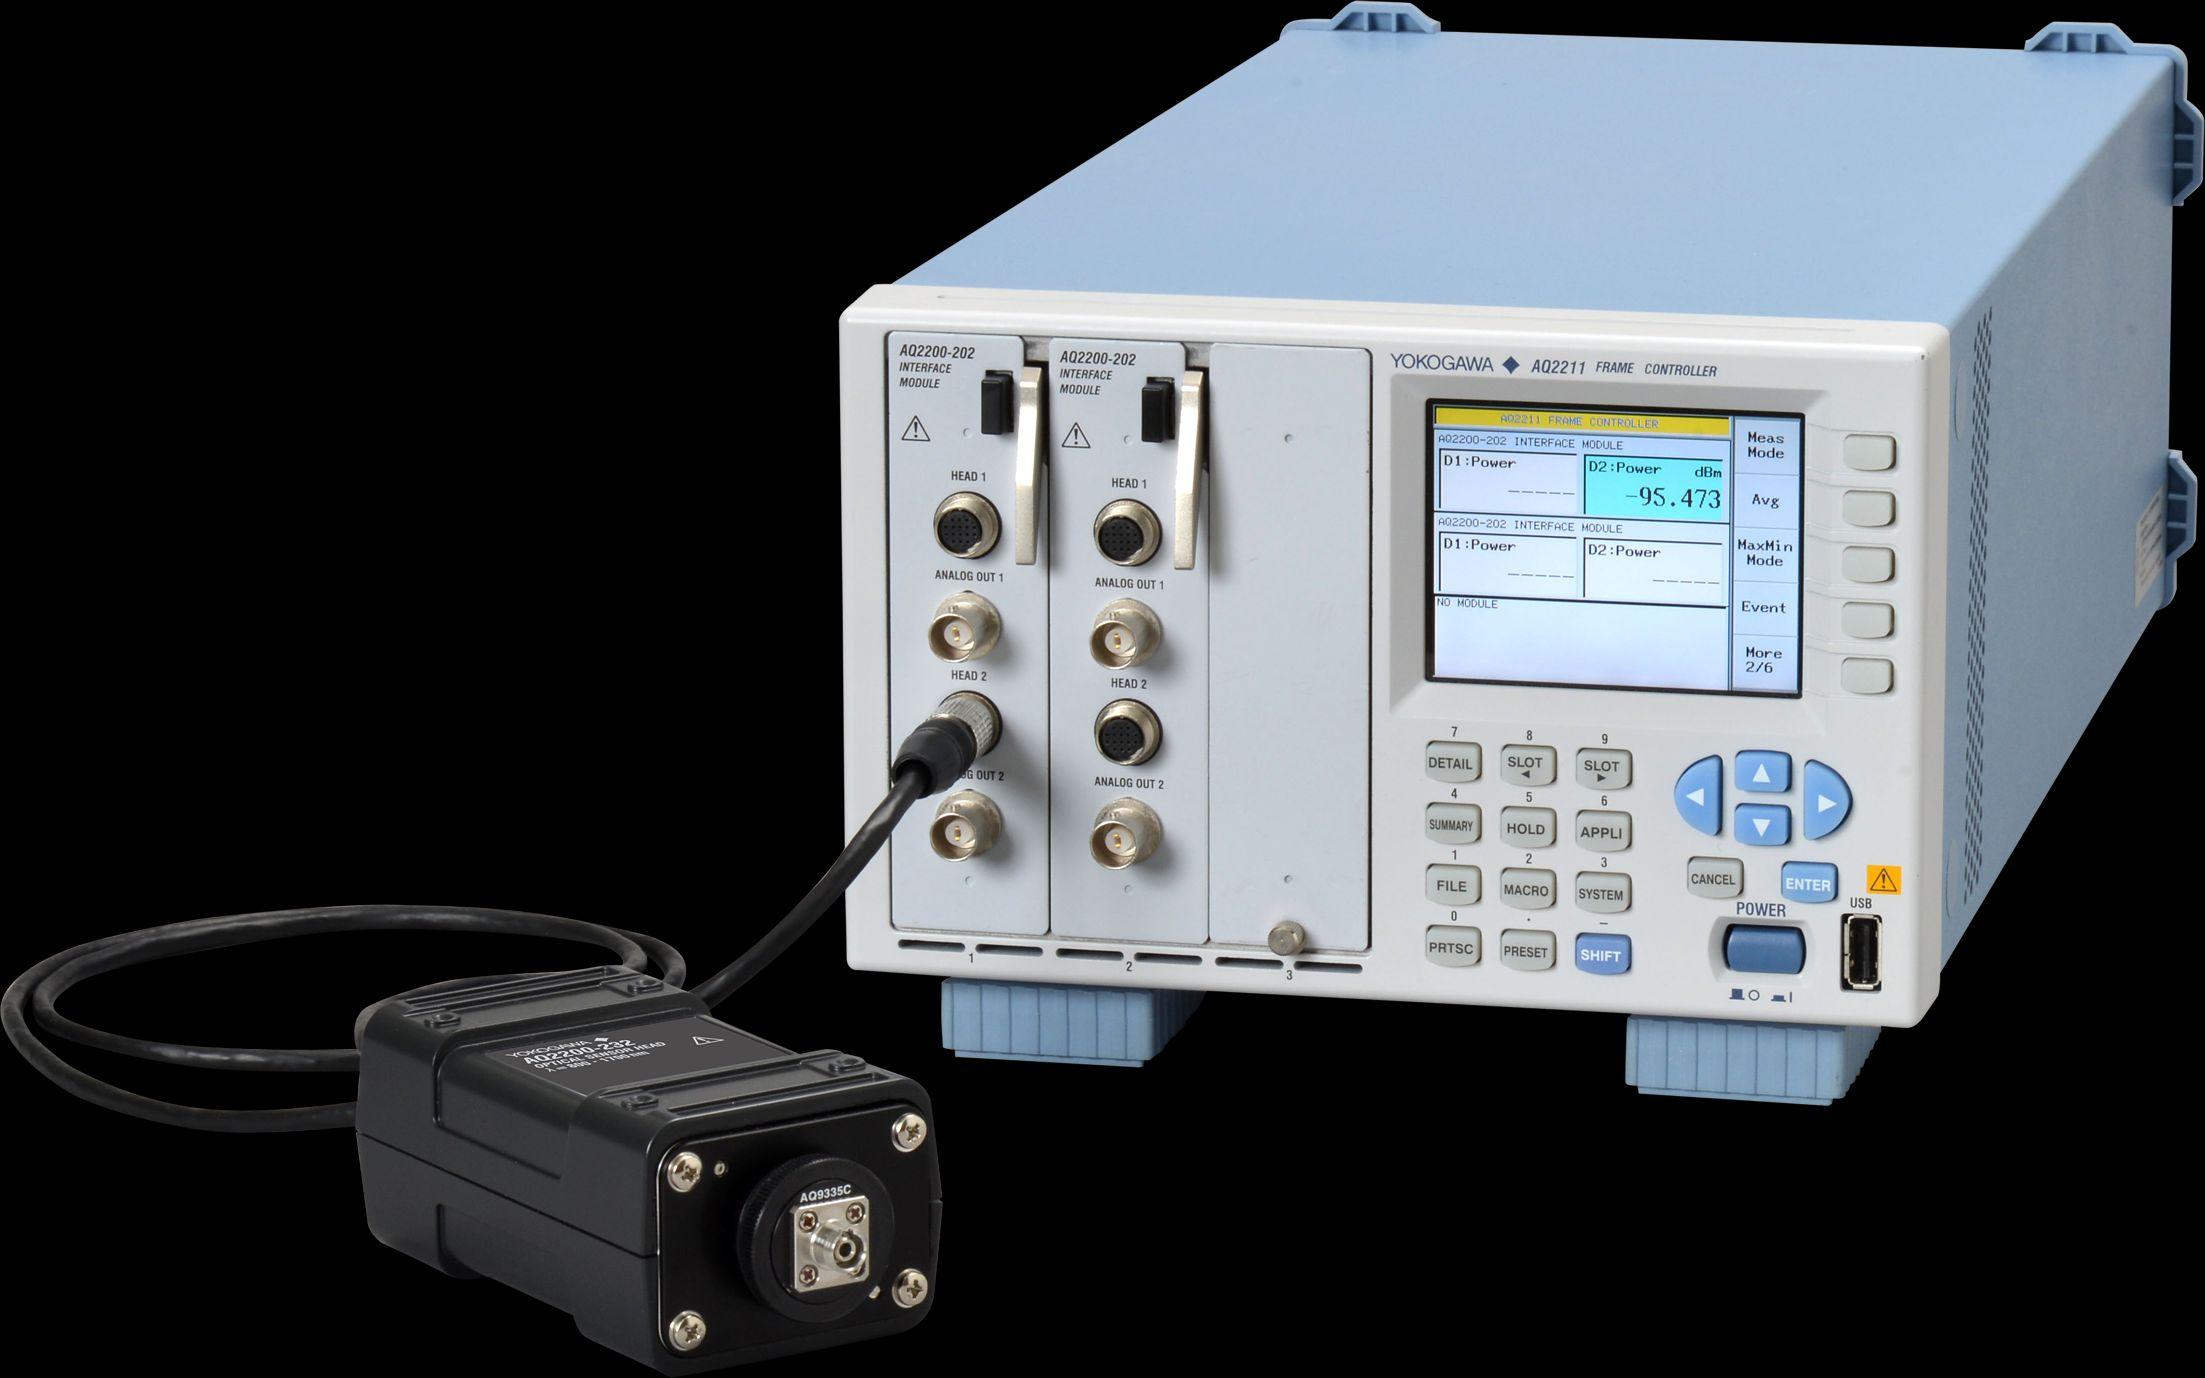 Yokogawa optical sensor head and modular test platform